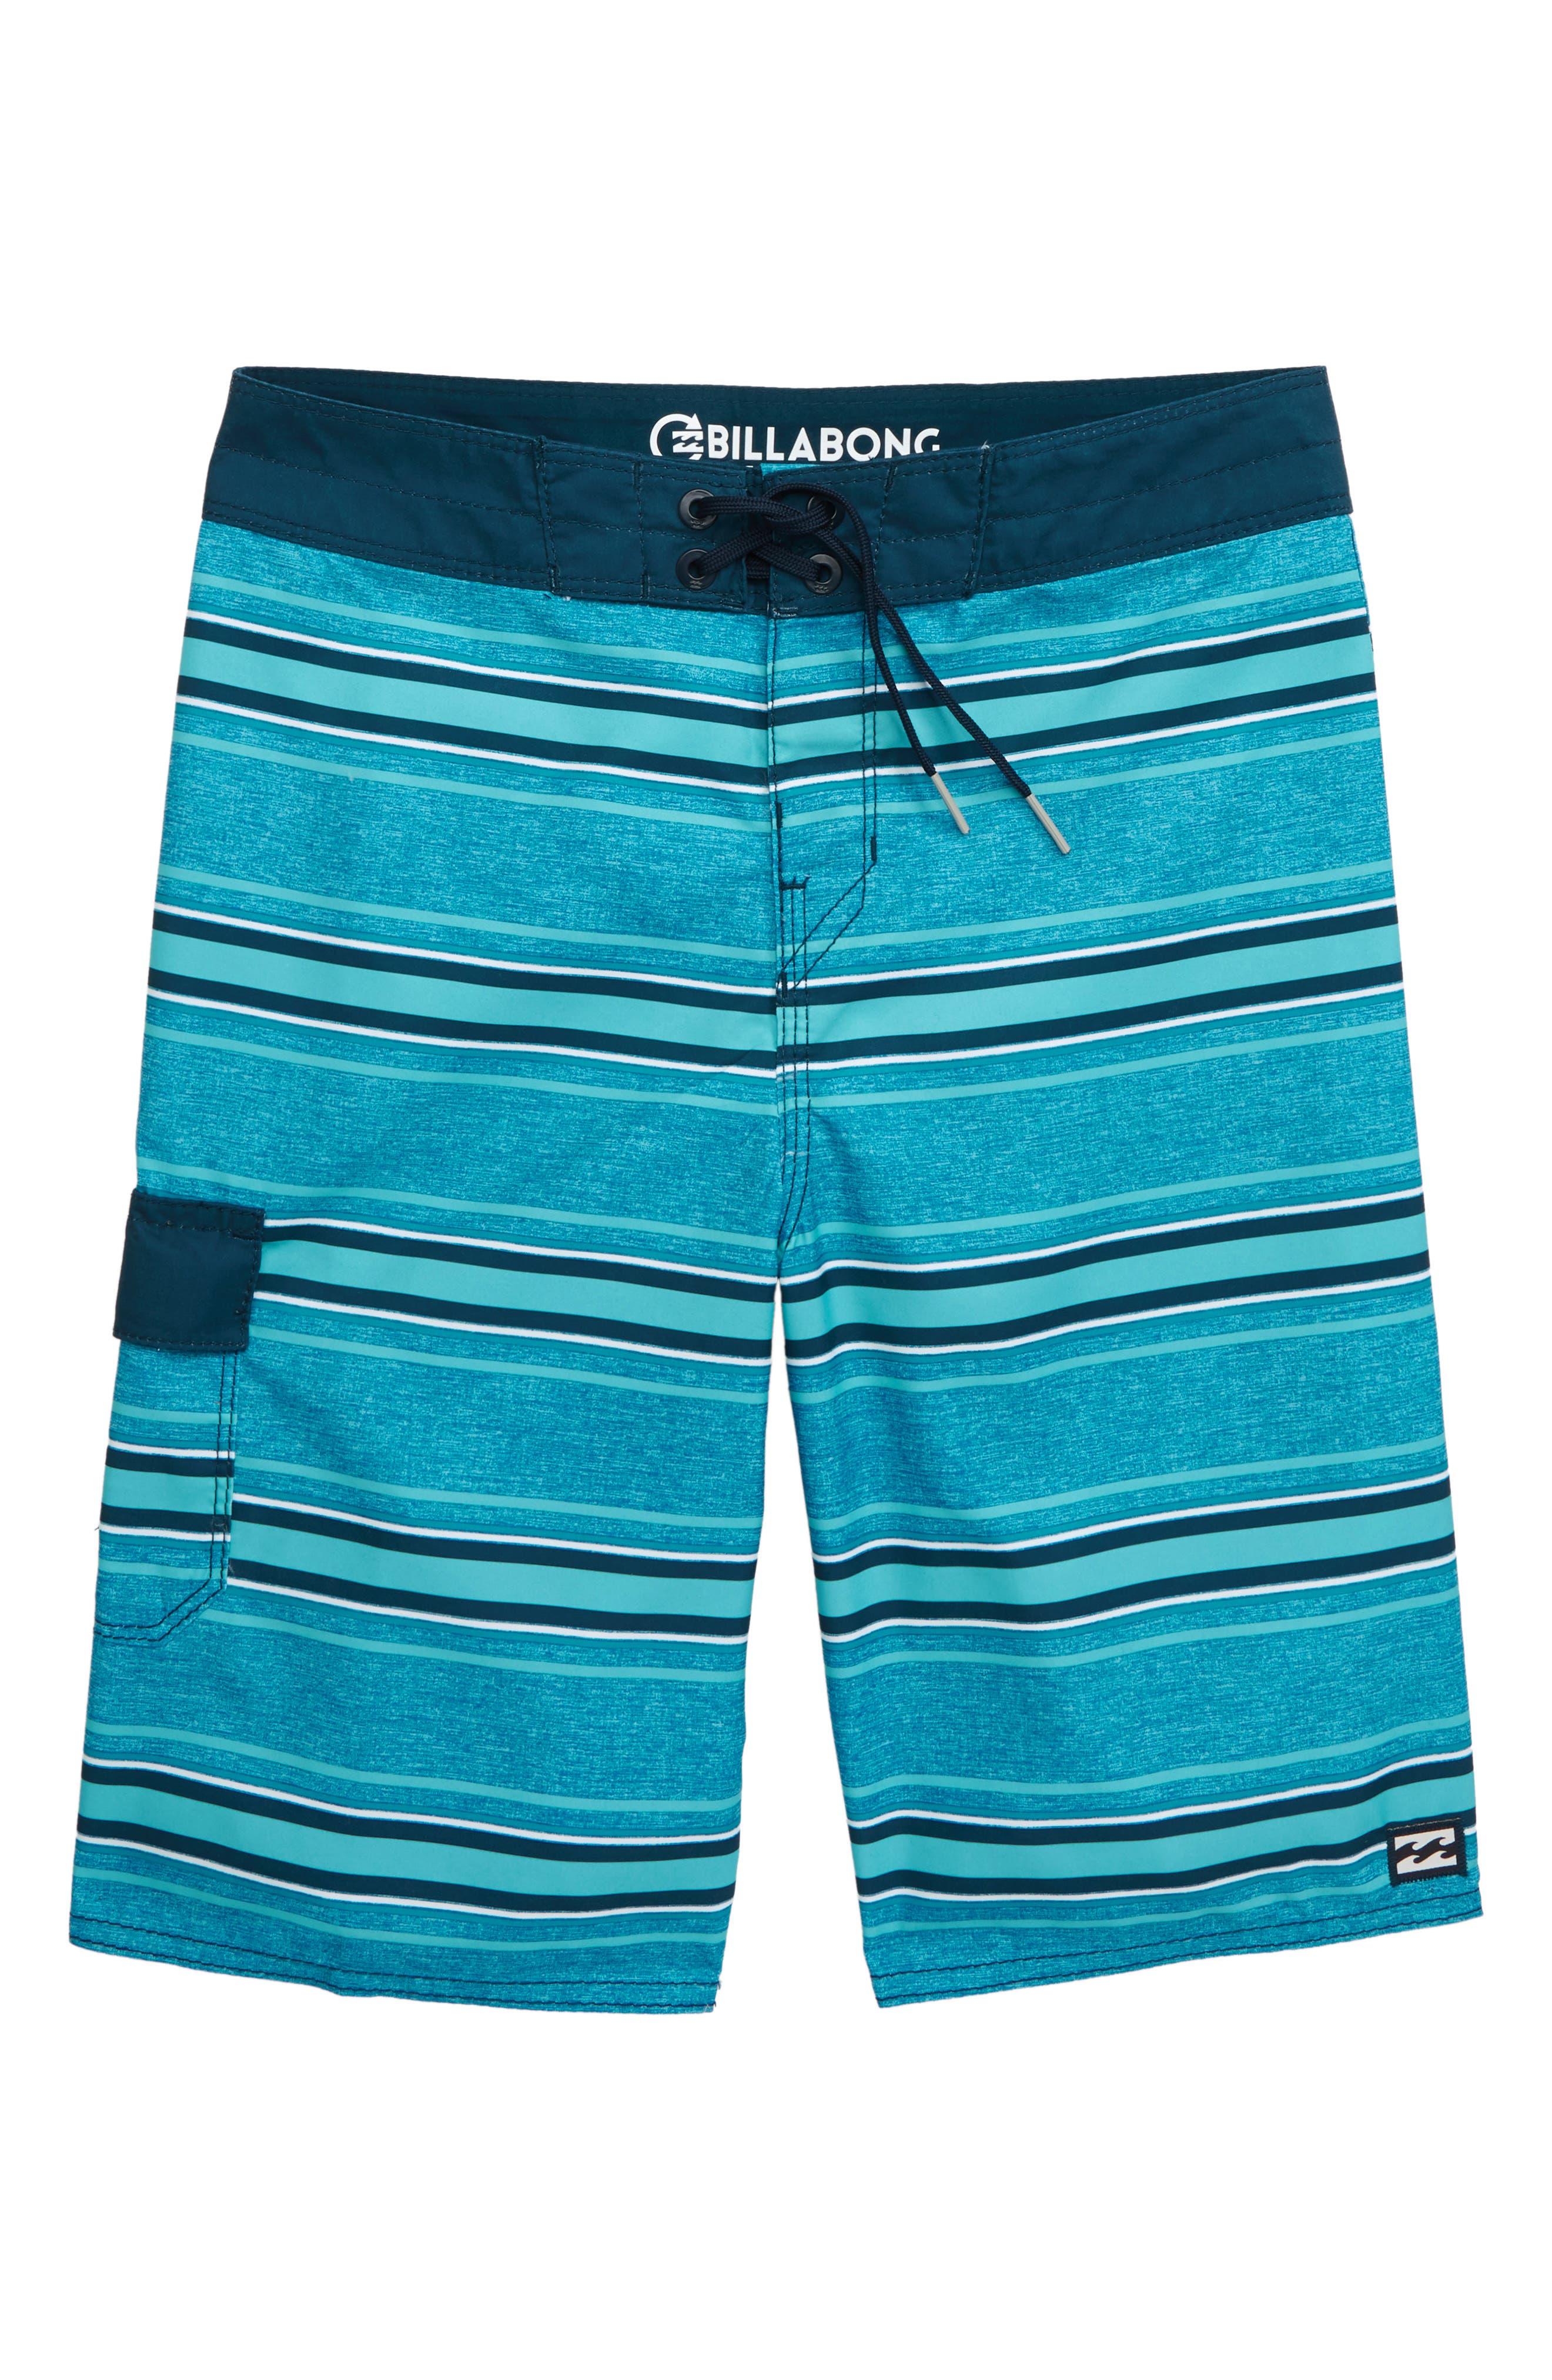 8a861f4c2f Boy's Billabong All Day Parallel Og Board Shorts, Blue